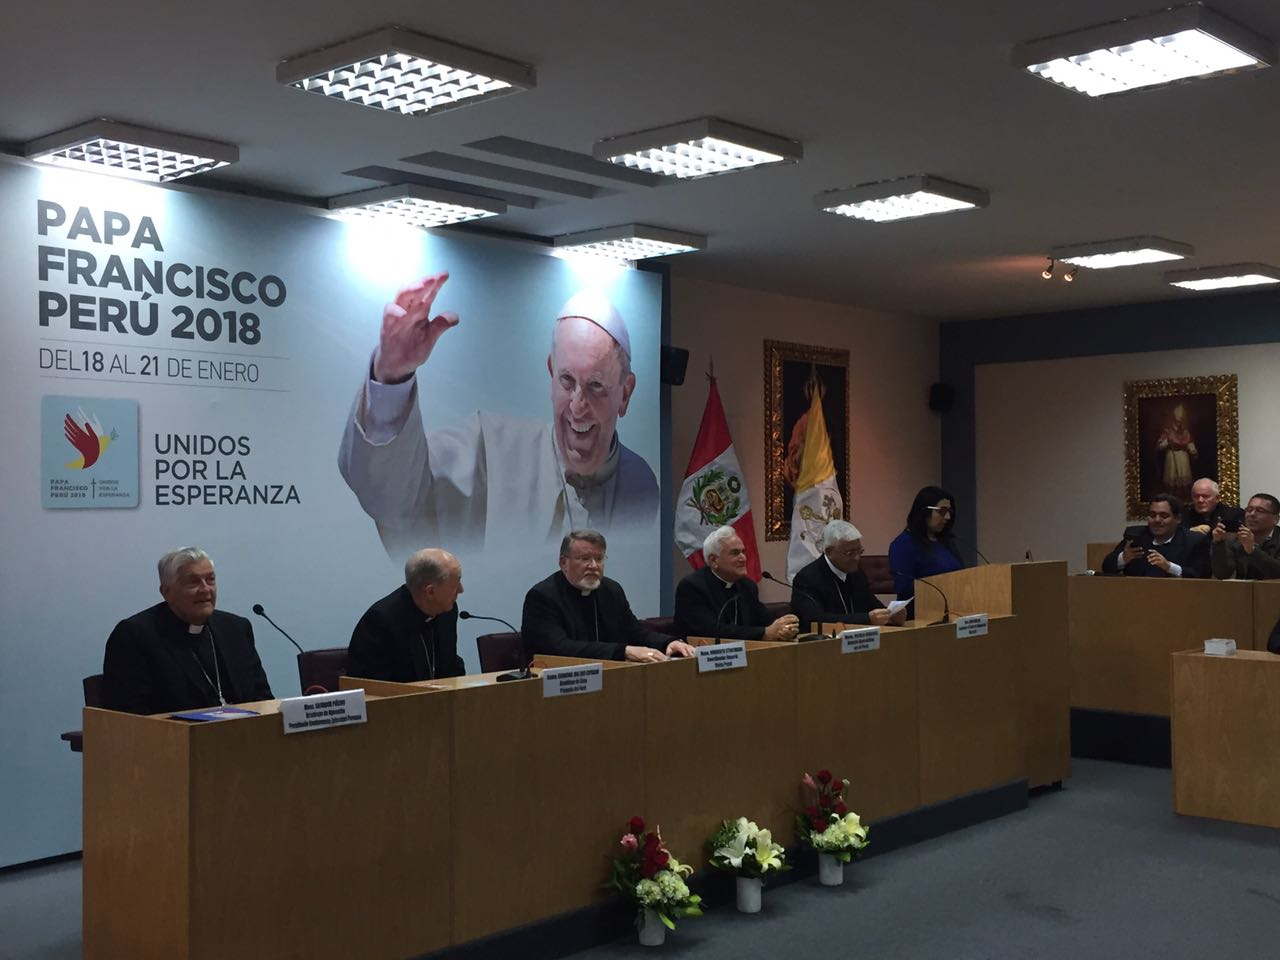 Rued de prensa en la Conferencia Episcopal de Perú © Twitter: @ElPapaenPeru